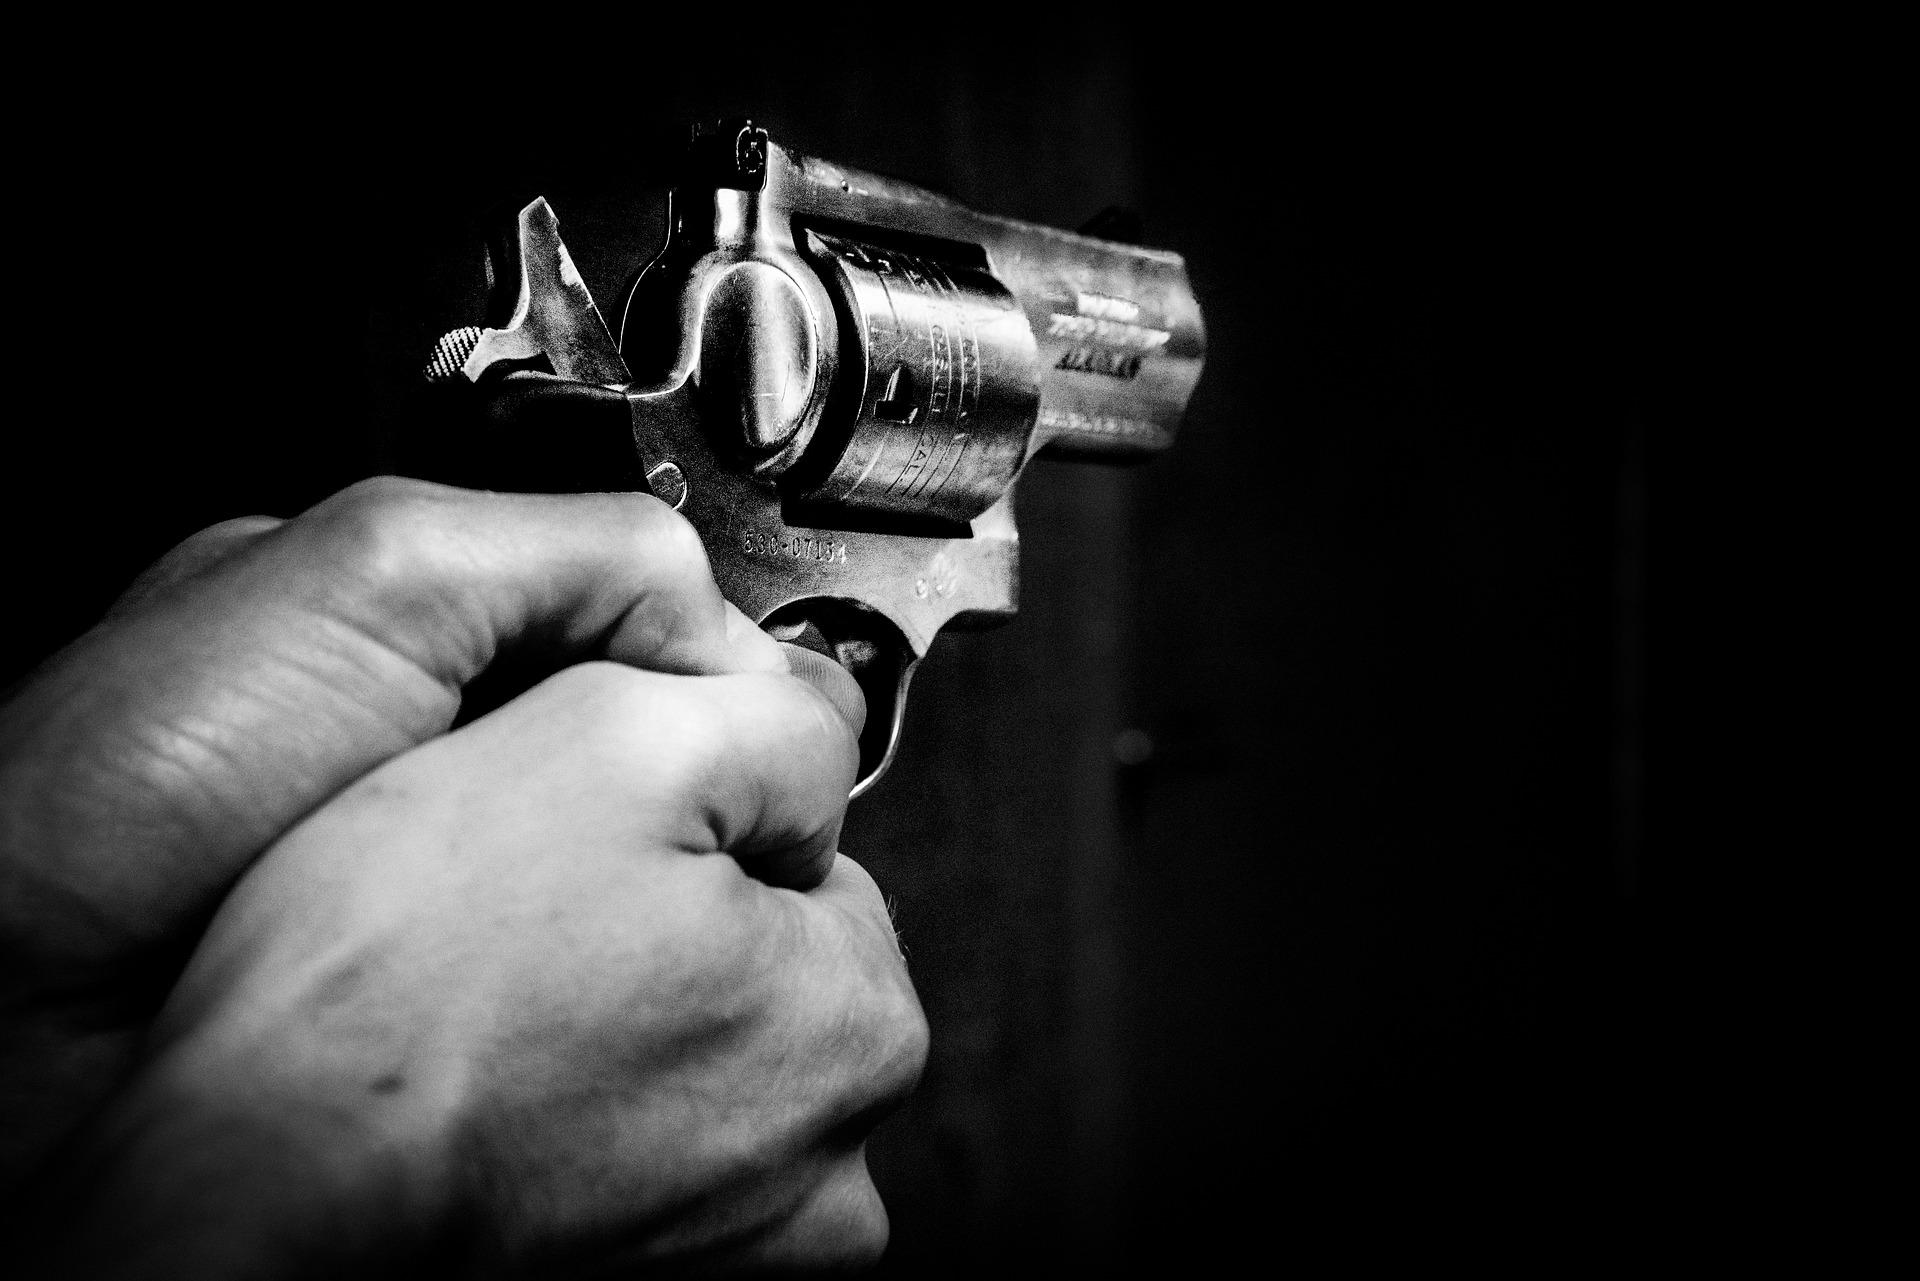 The Disturbing Facts of Gun Violence in America